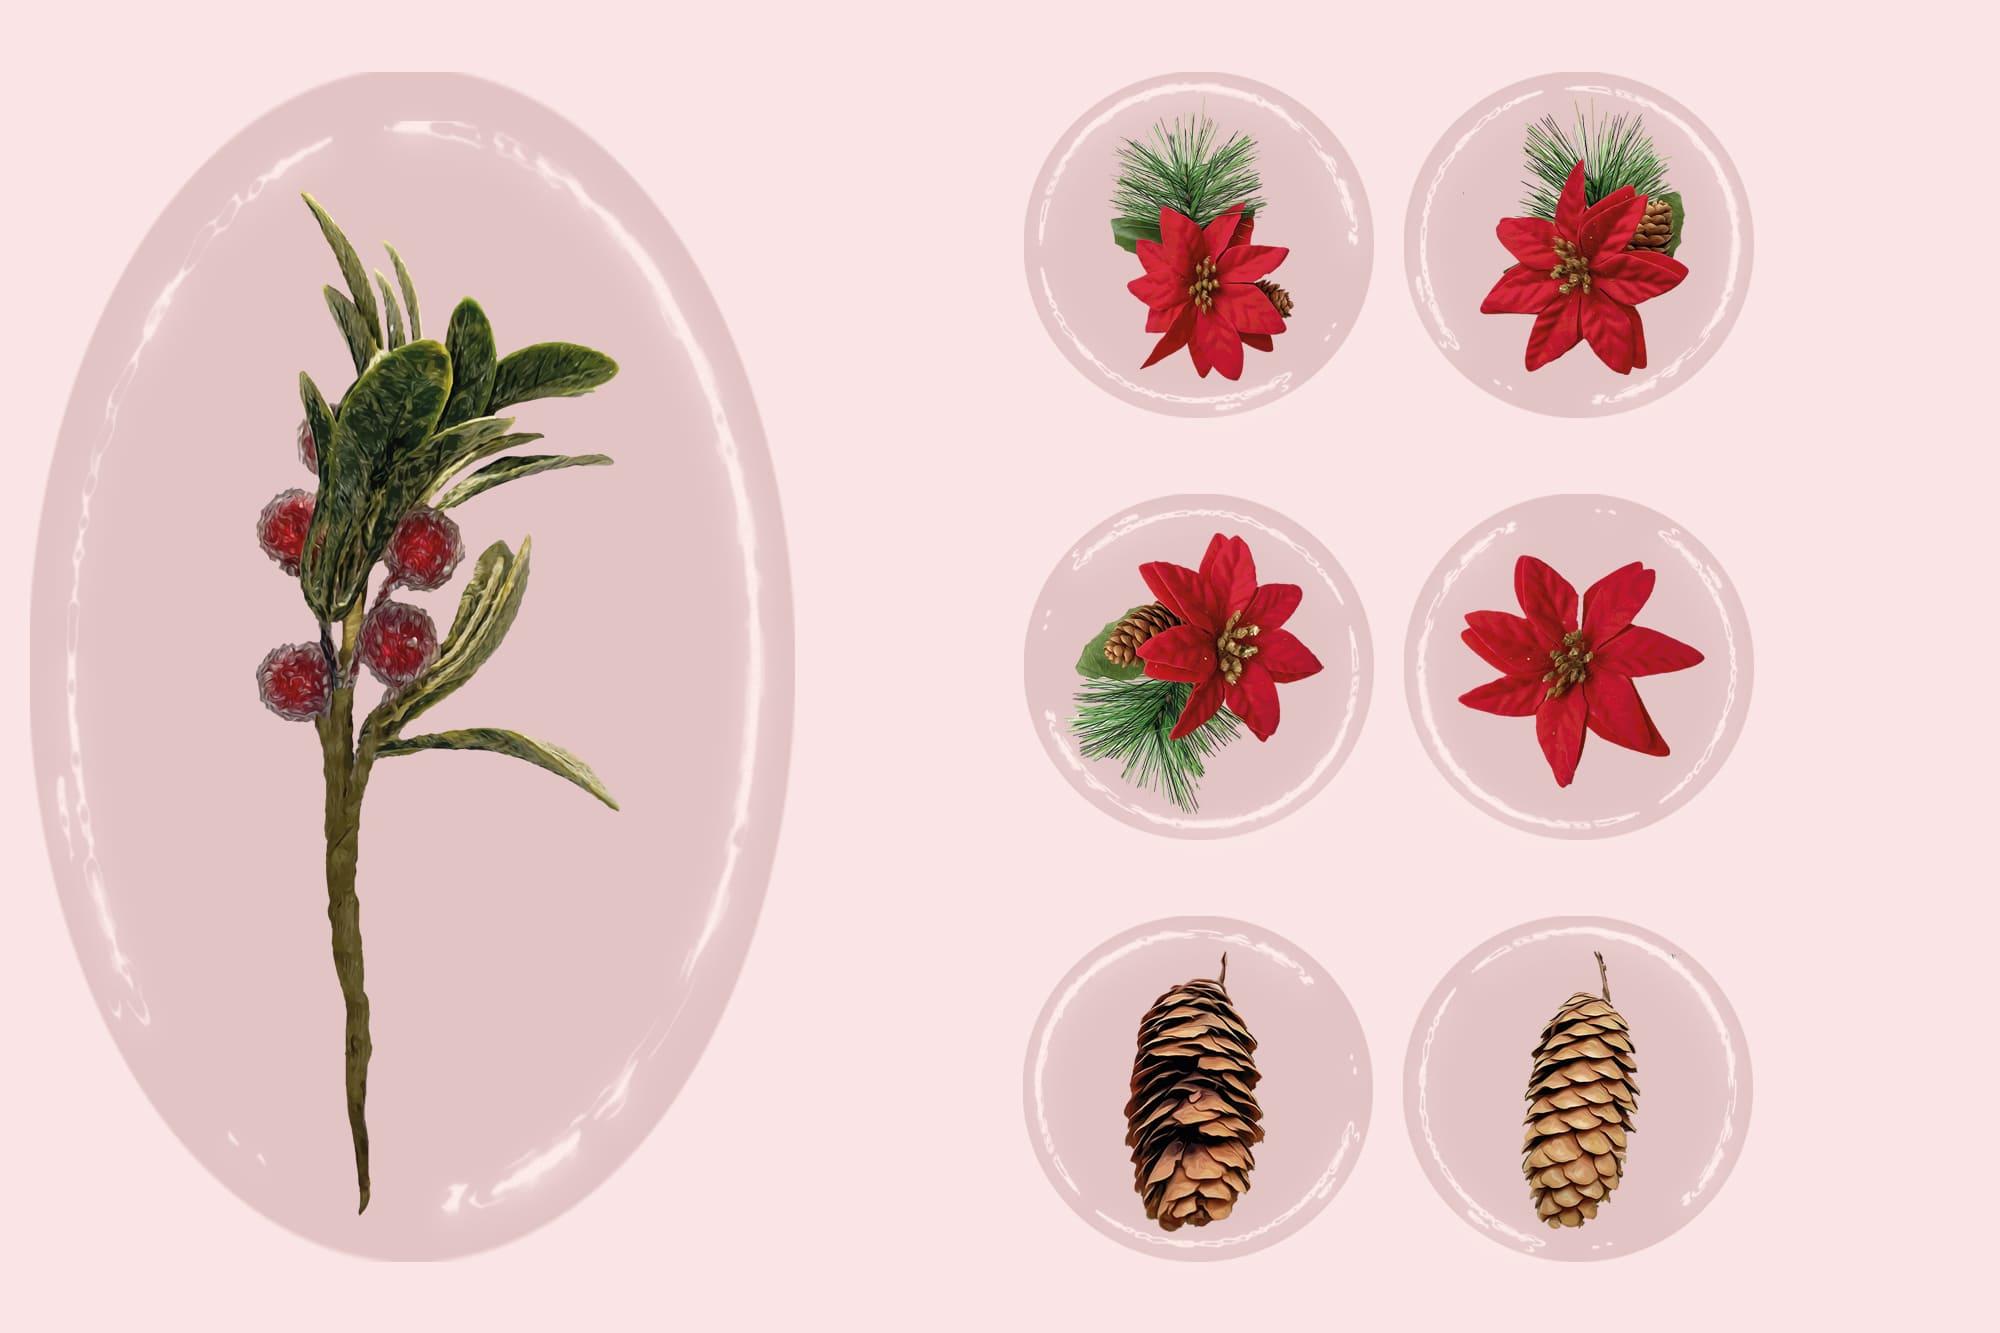 496 Christmas Illustrations: Christmas Vectors Bundle SVG, EPS, AI - Merry Christmas 3d